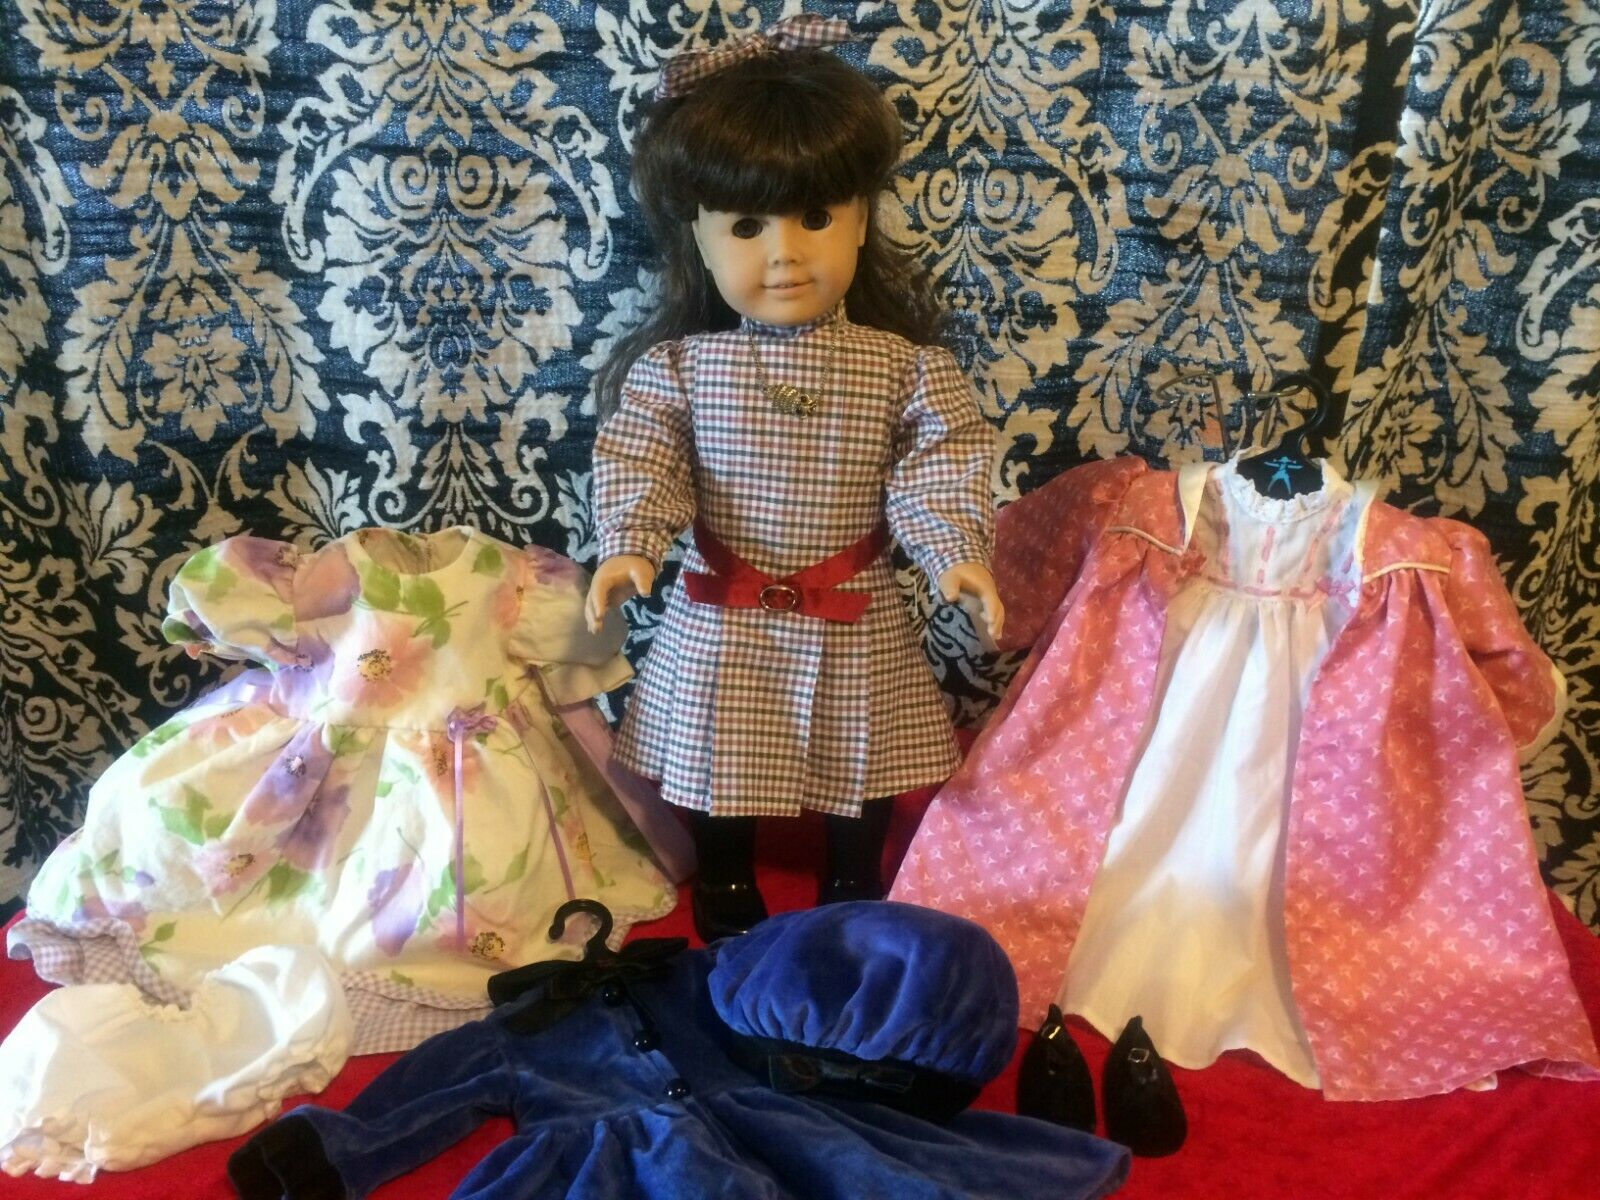 American Girl Doll Samantha 18  RETIrot Pleasant Co. W Original, Retirot outfits